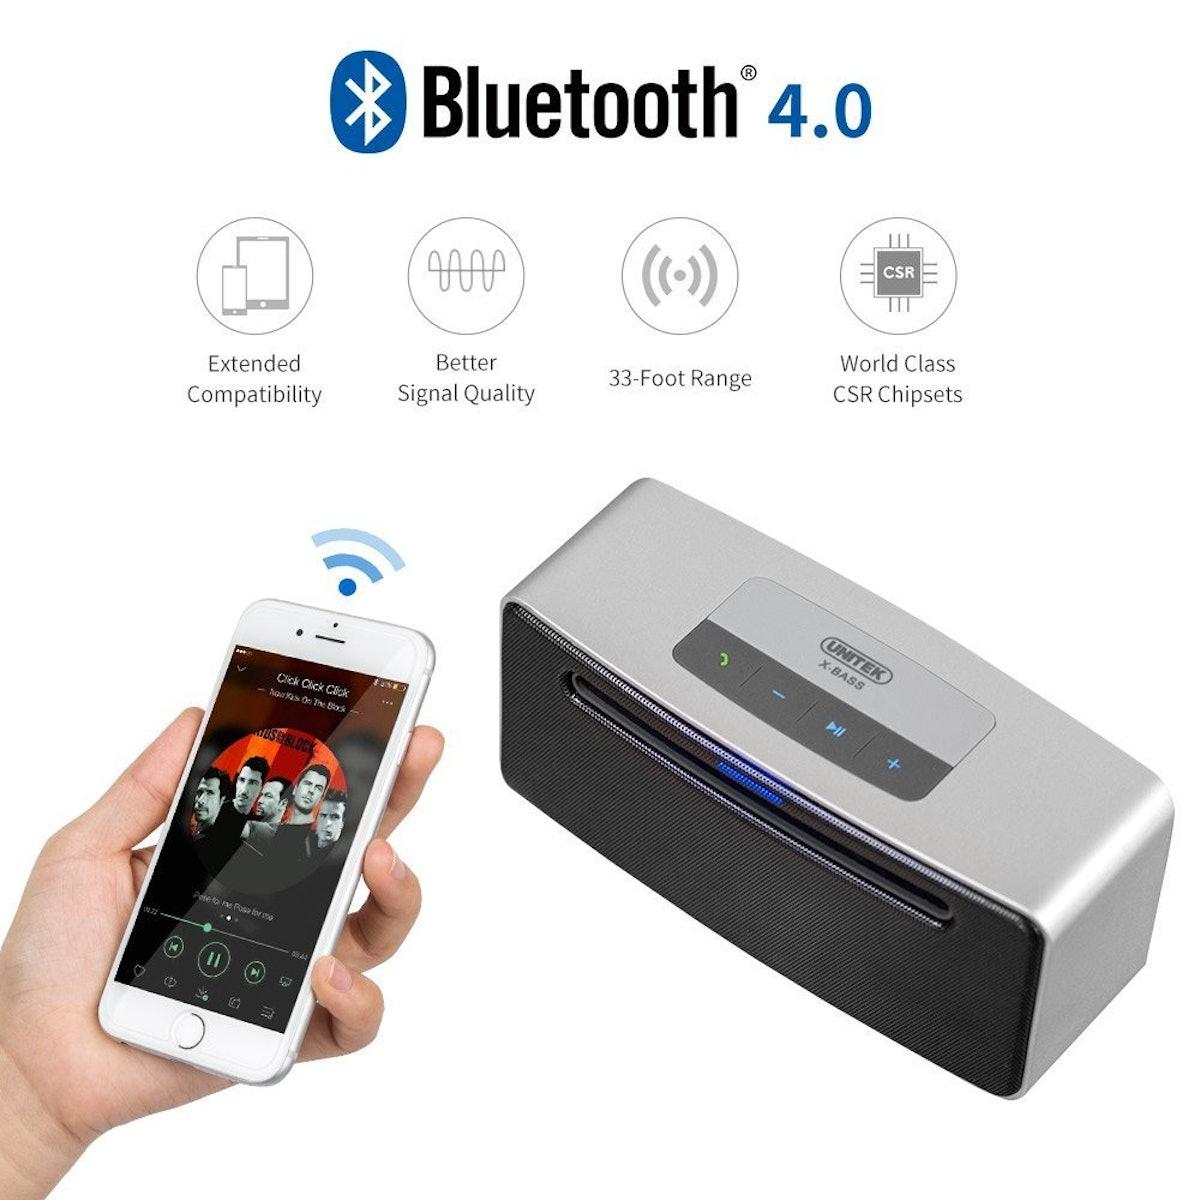 Unitek Portable Bluetooth Speaker